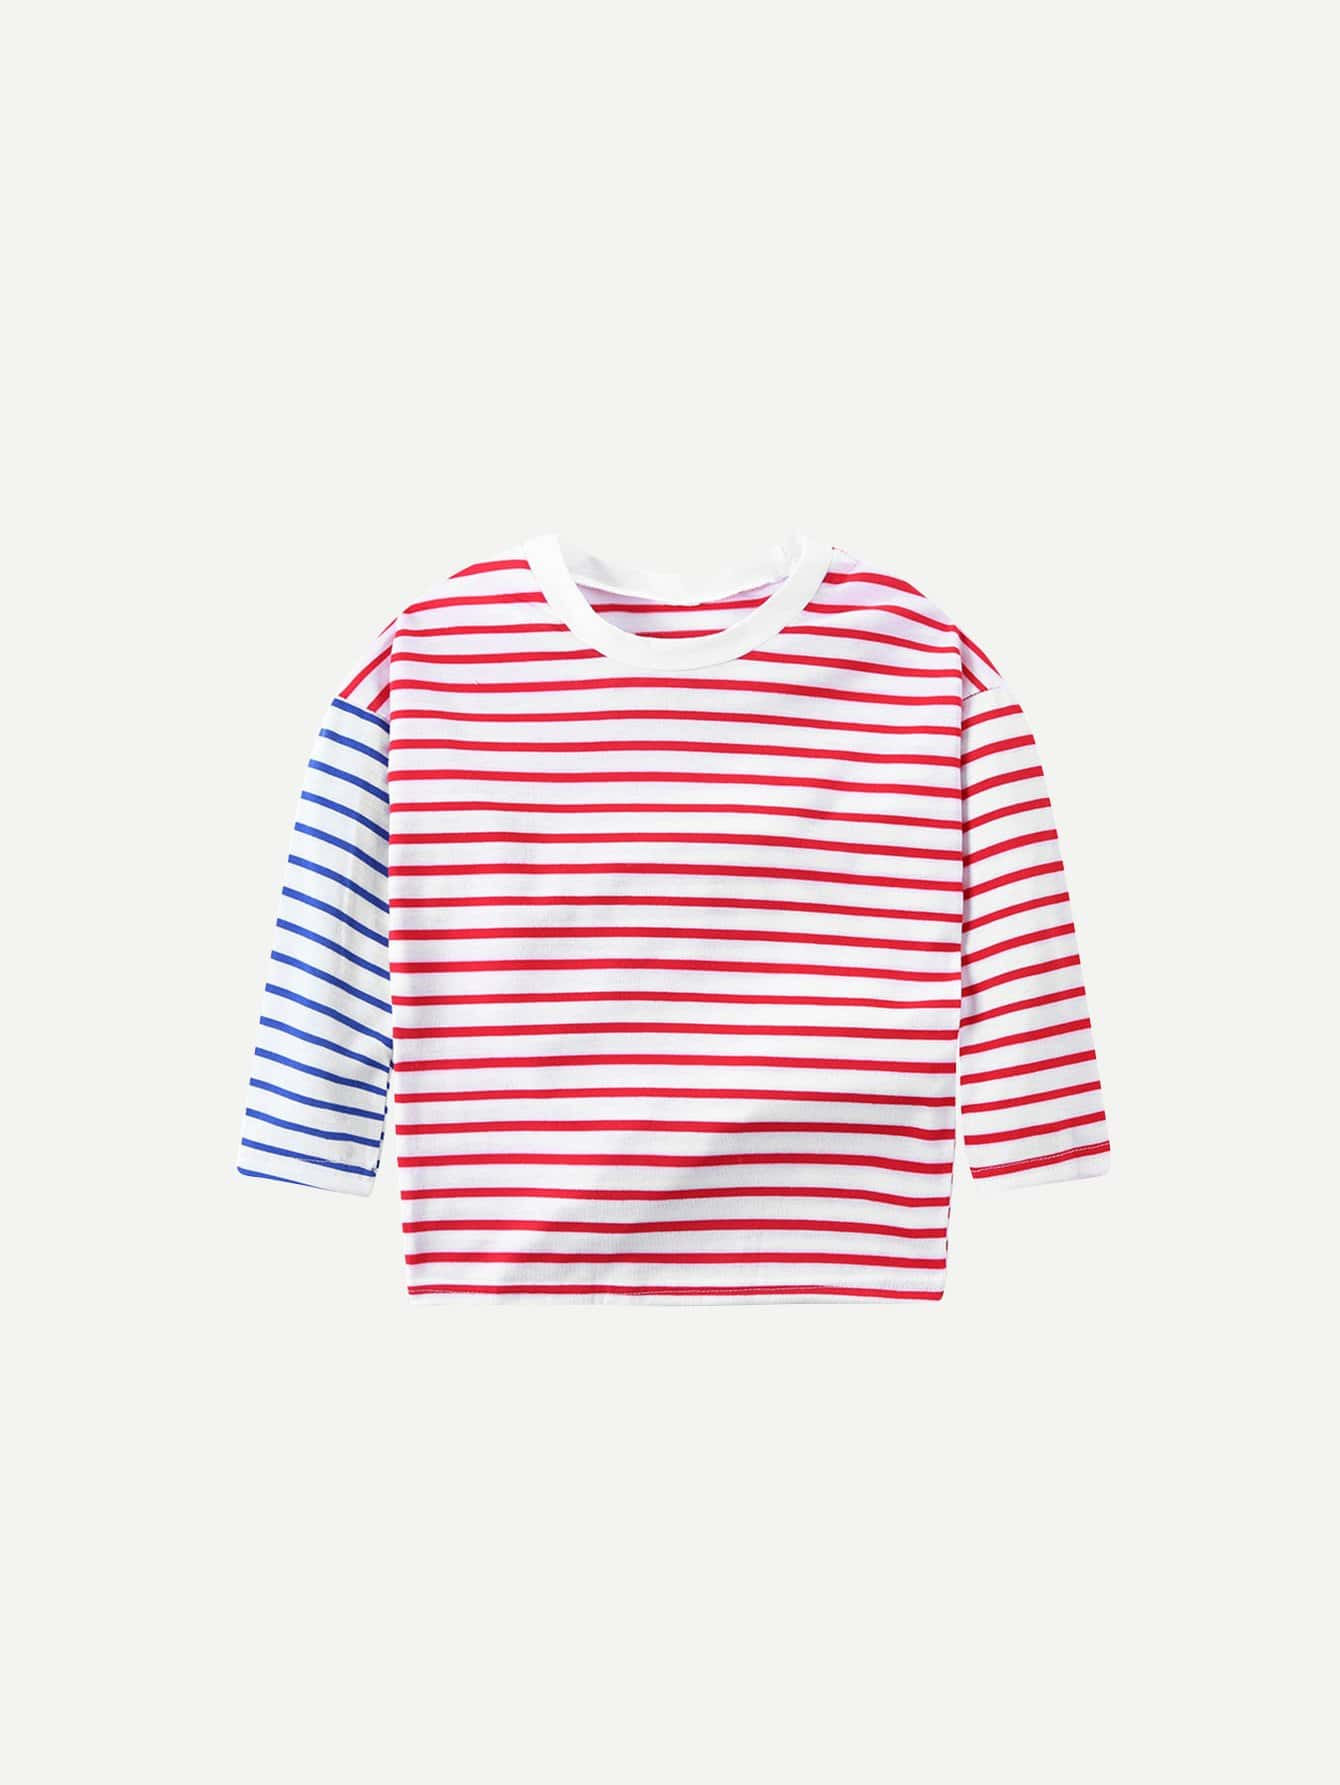 Kids Contrast Striped Tee contrast striped trim camo print tee